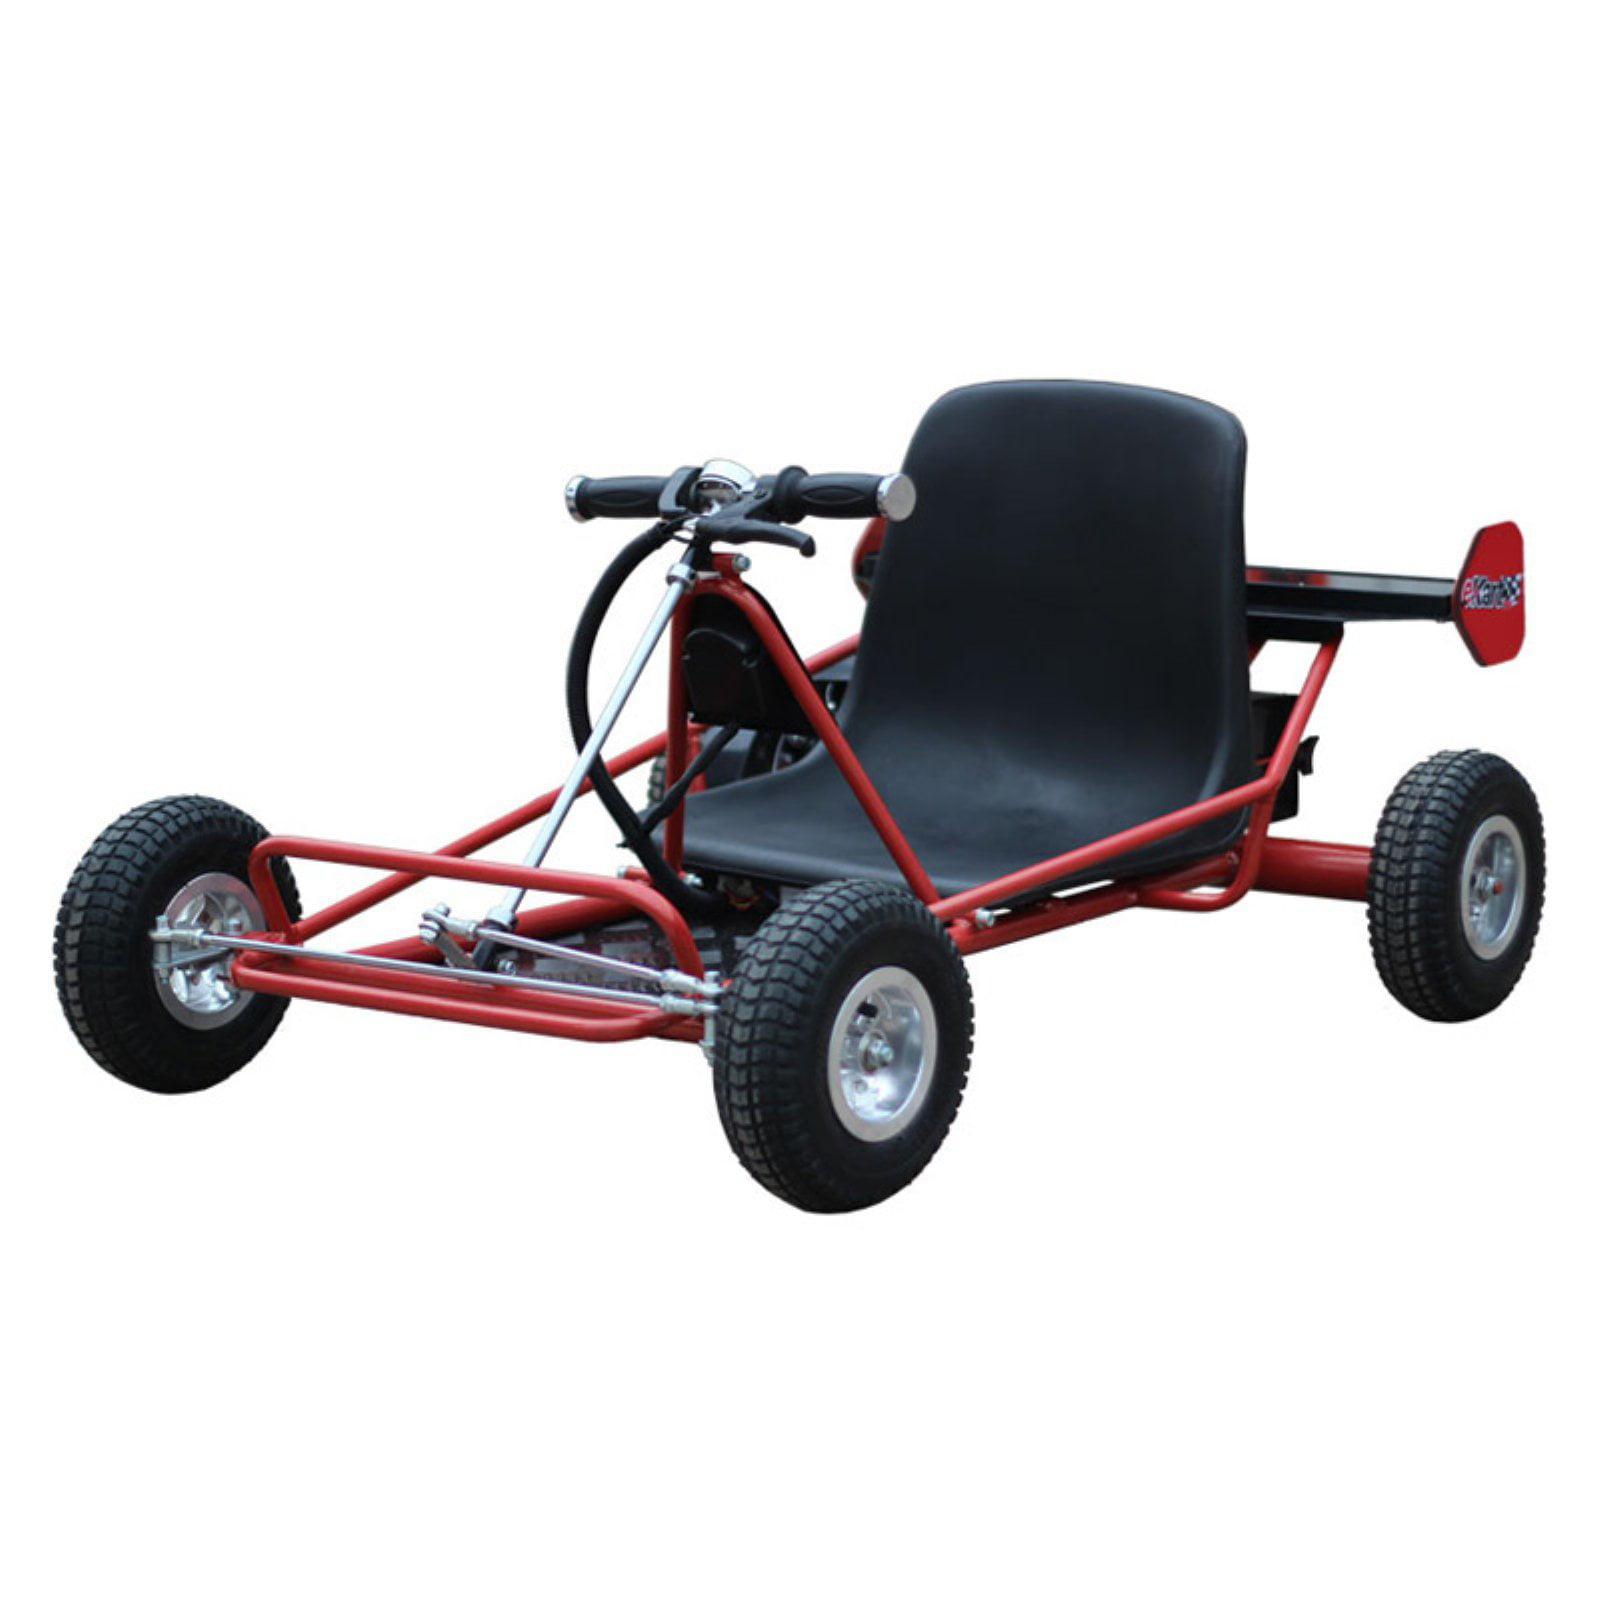 MotoTec Solar Electric 24V Go Kart, Red